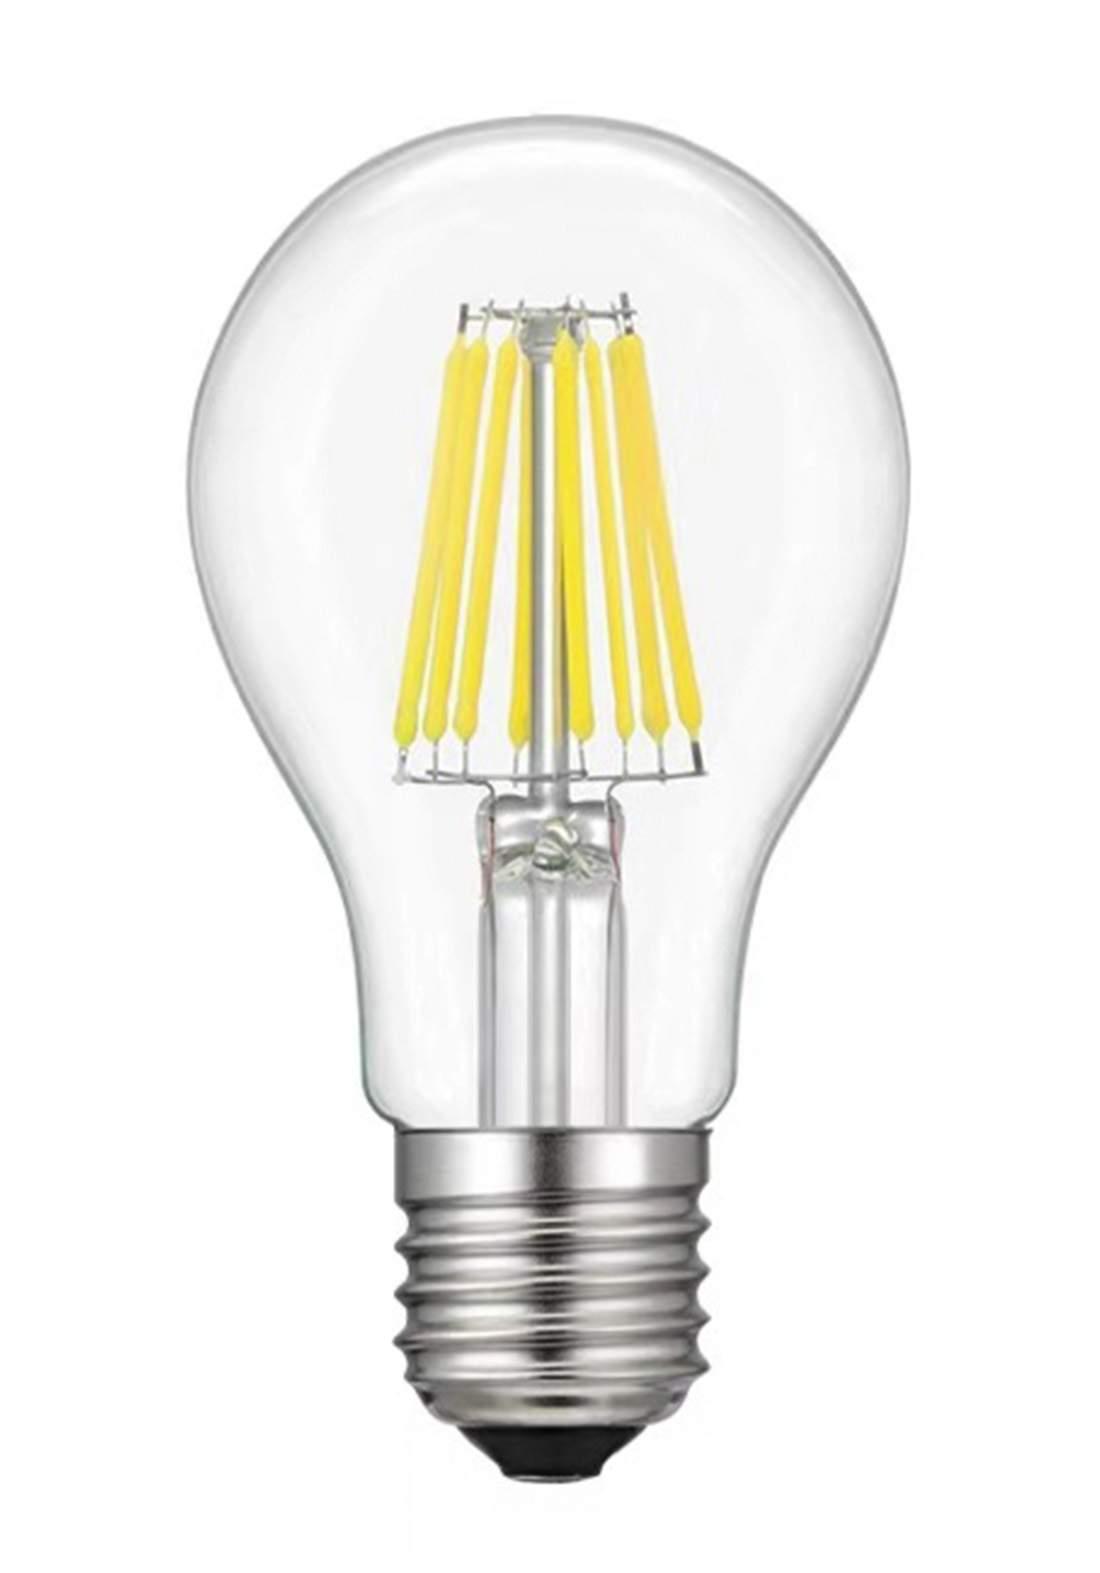 Led filament A60 smart bulb مصباح ليد